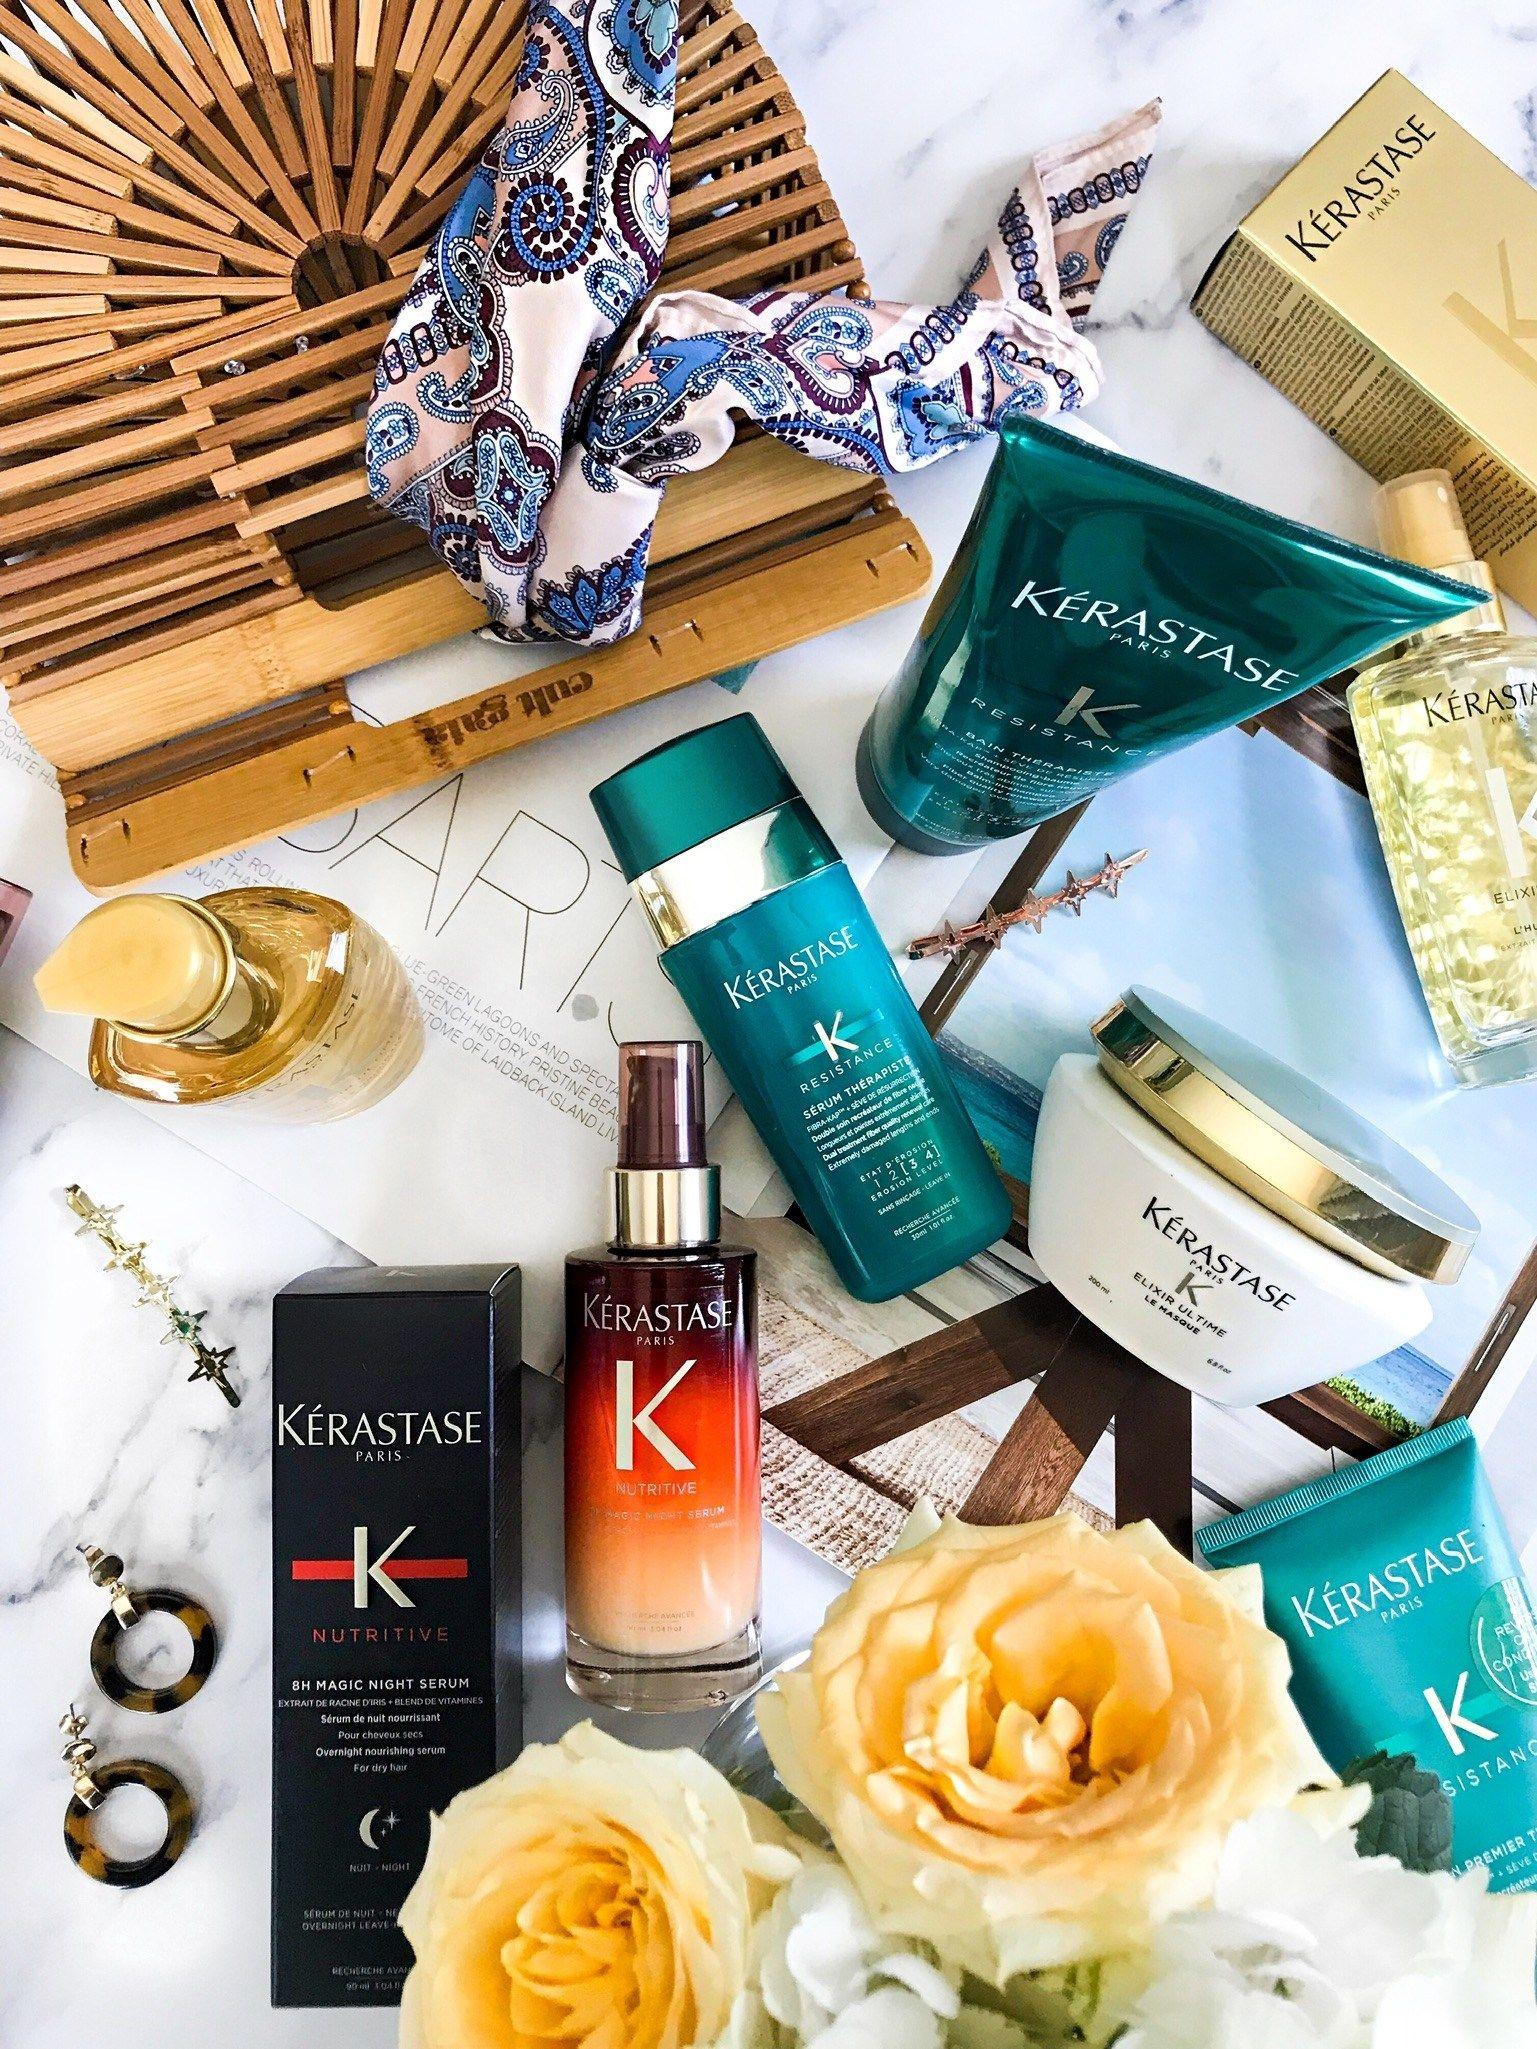 A Serum For Your Hair? Kérastase's NEW Nutritive 8H Magic